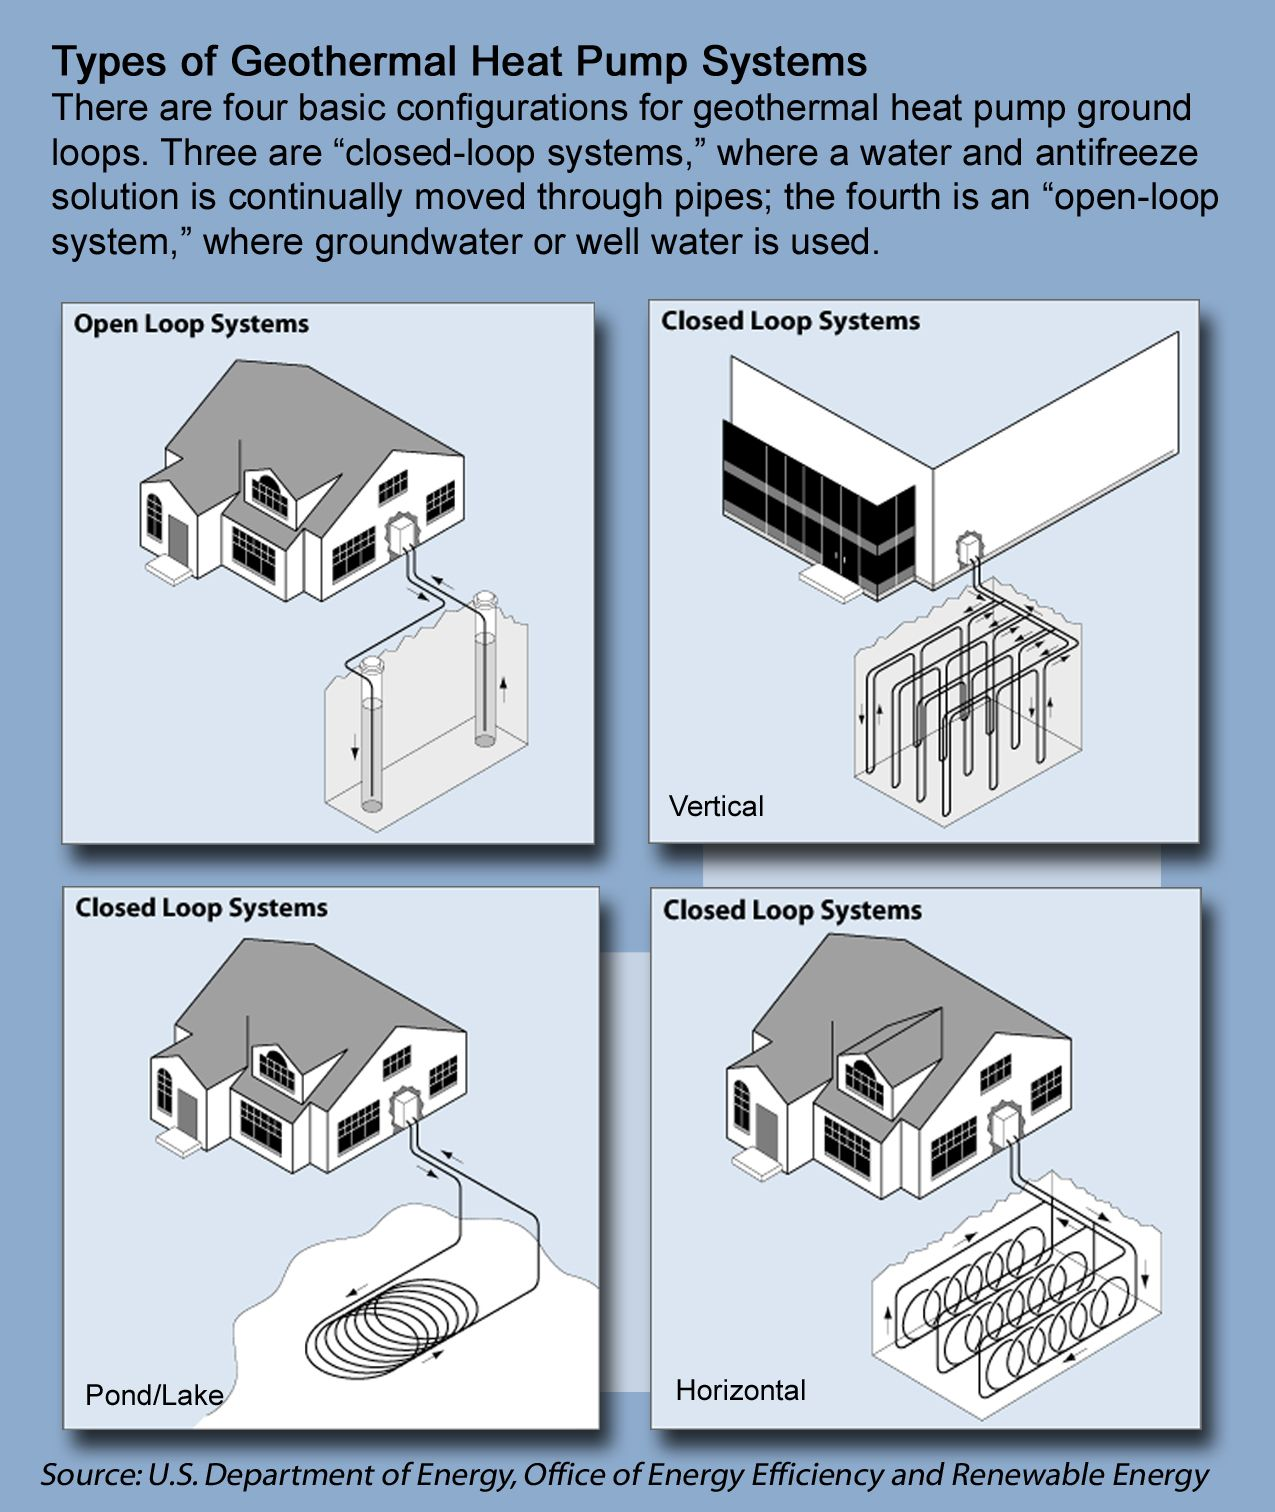 Should I Buy a Heat Pump? | DIY Energy Conservation